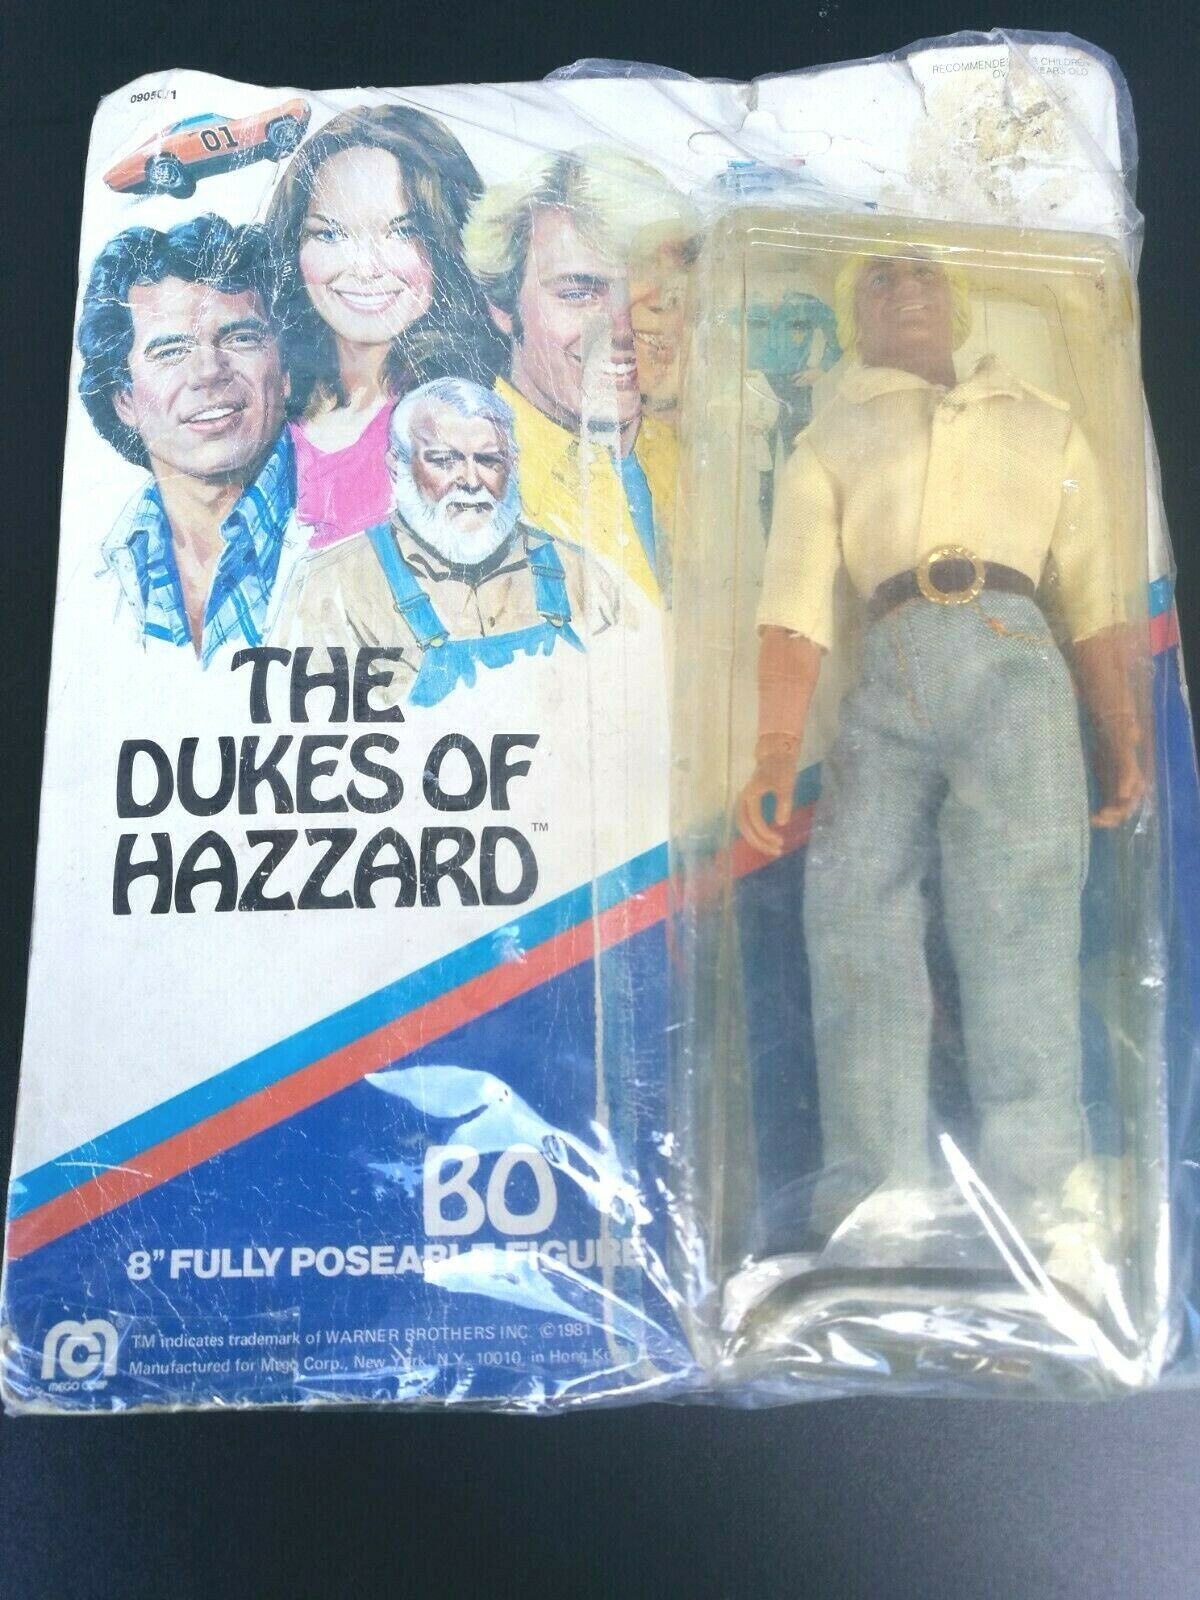 Figura MEGO CORP THE DUKES OF HAZZARD BO VINTAGE 1980 WARNER BROS 20 CM